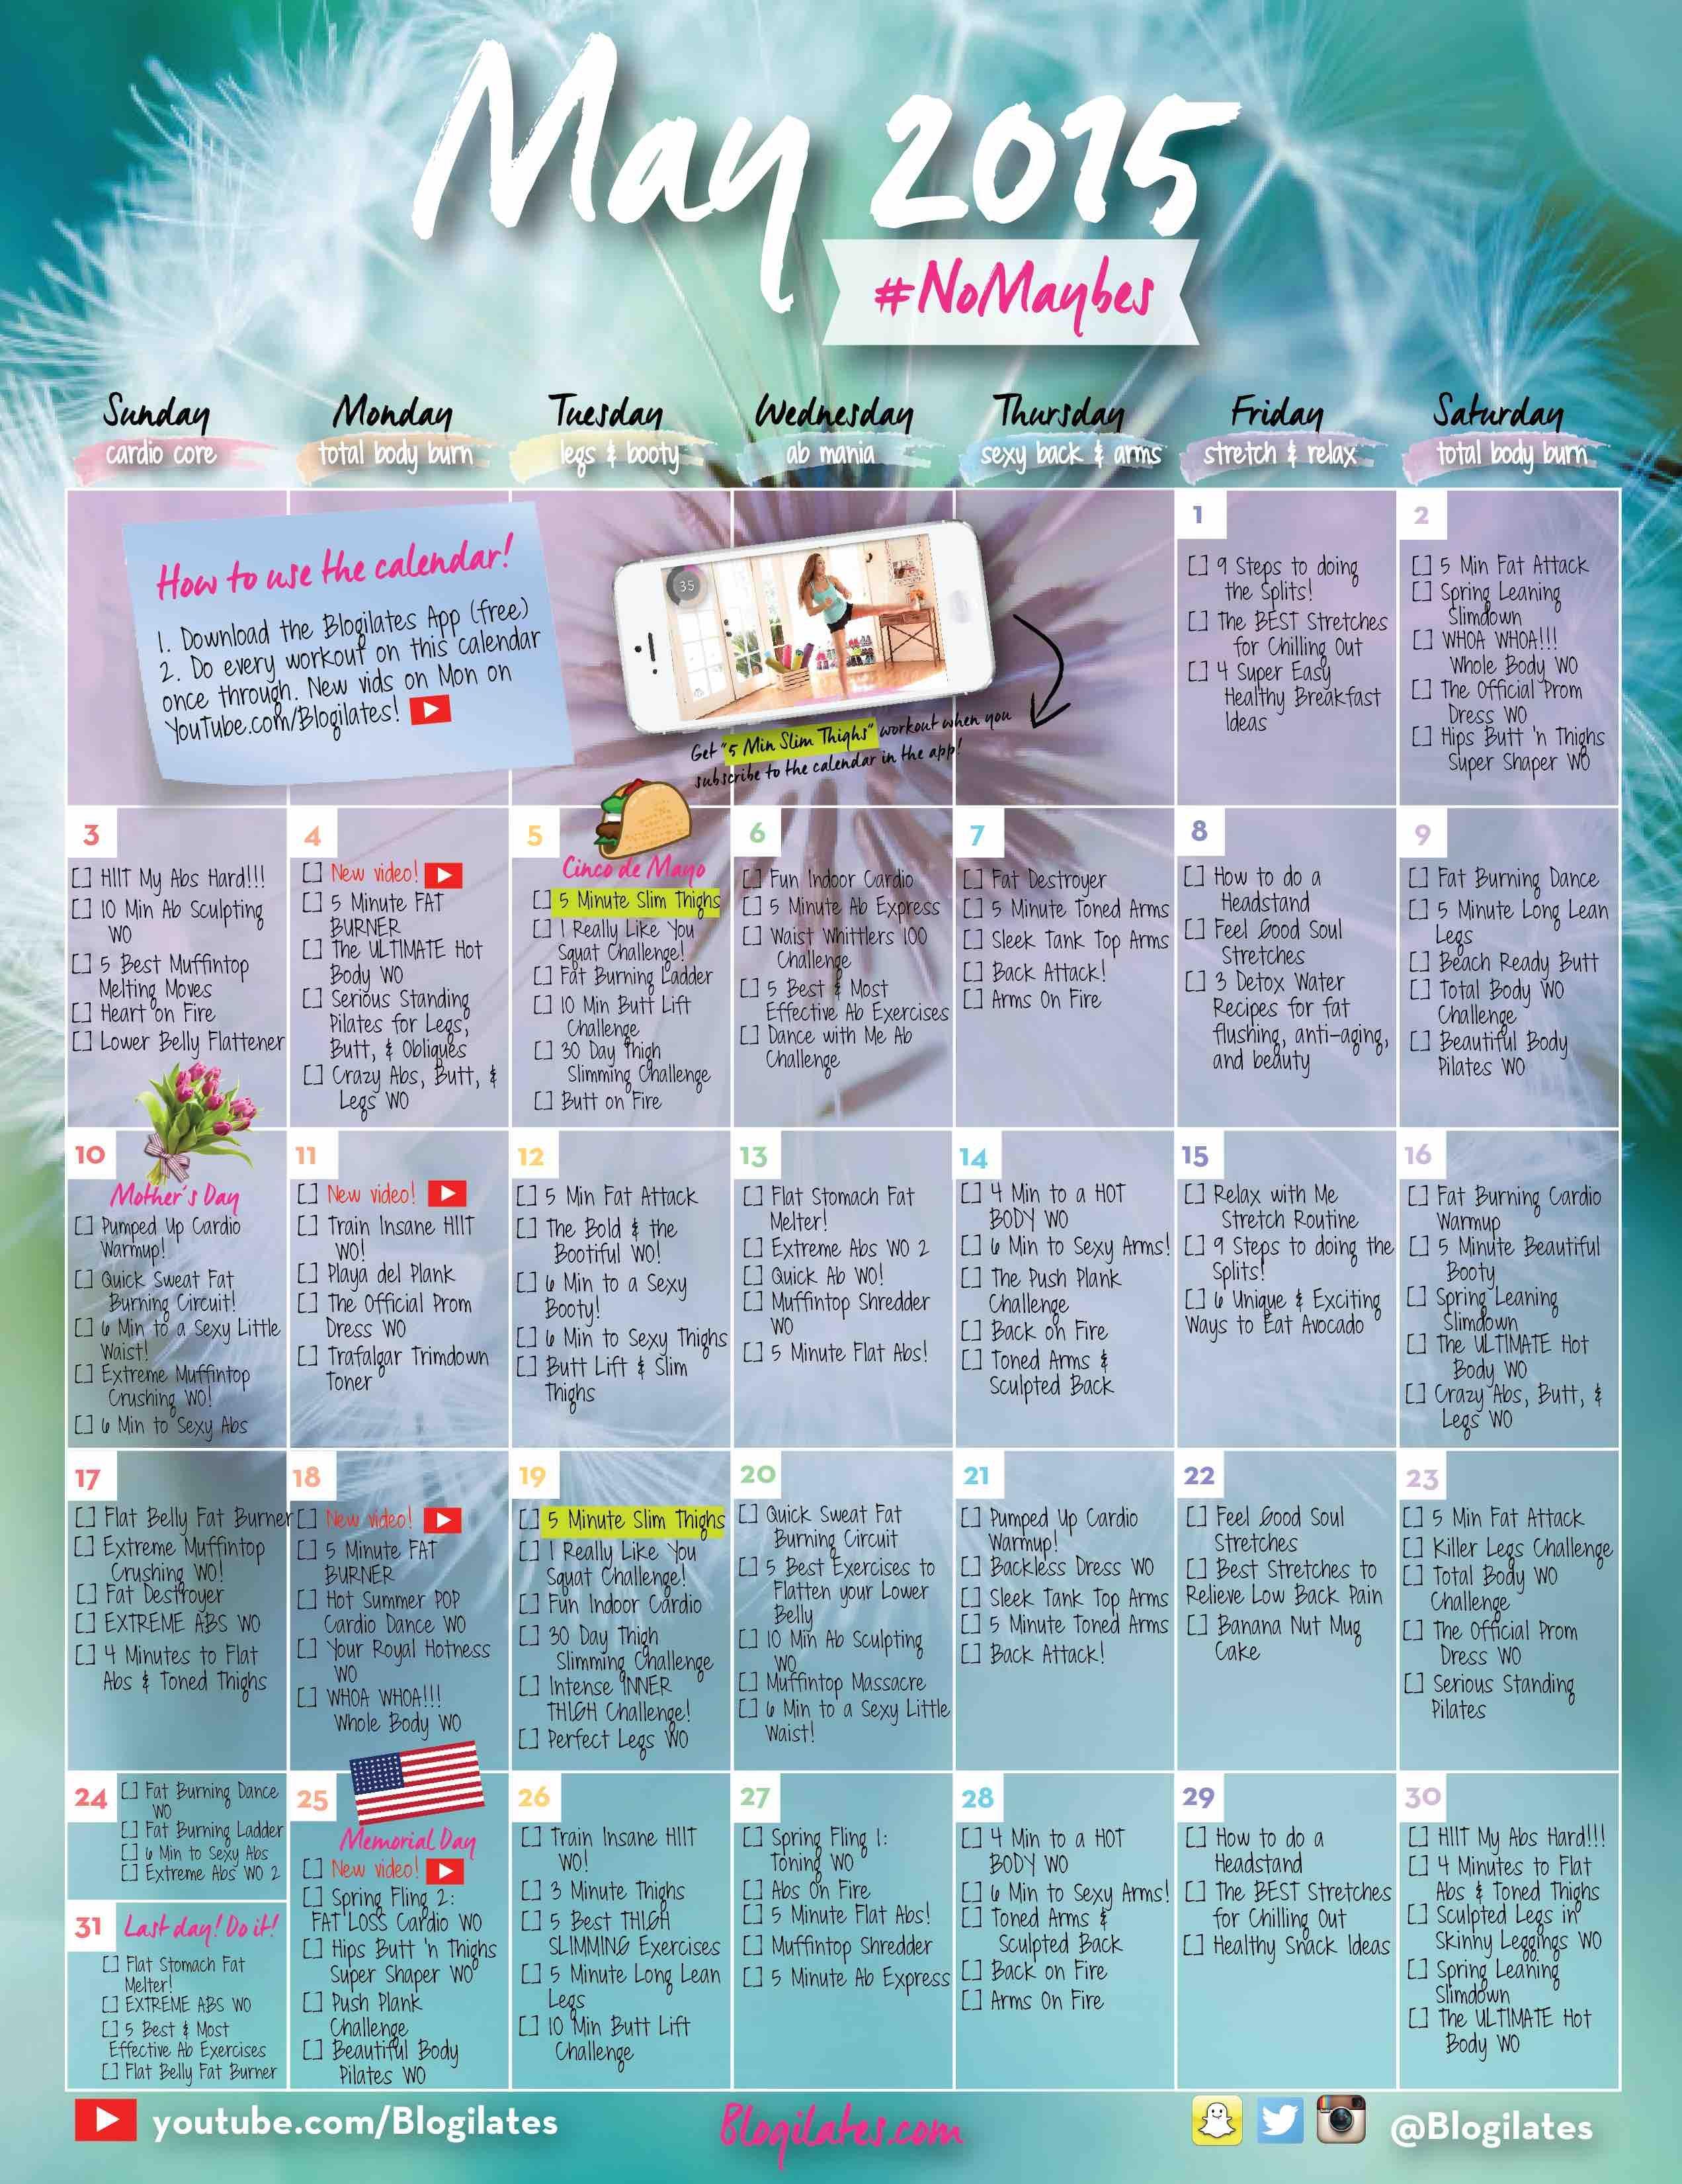 April Workout Calendar | Food And Drinks | Pinterest | Workout